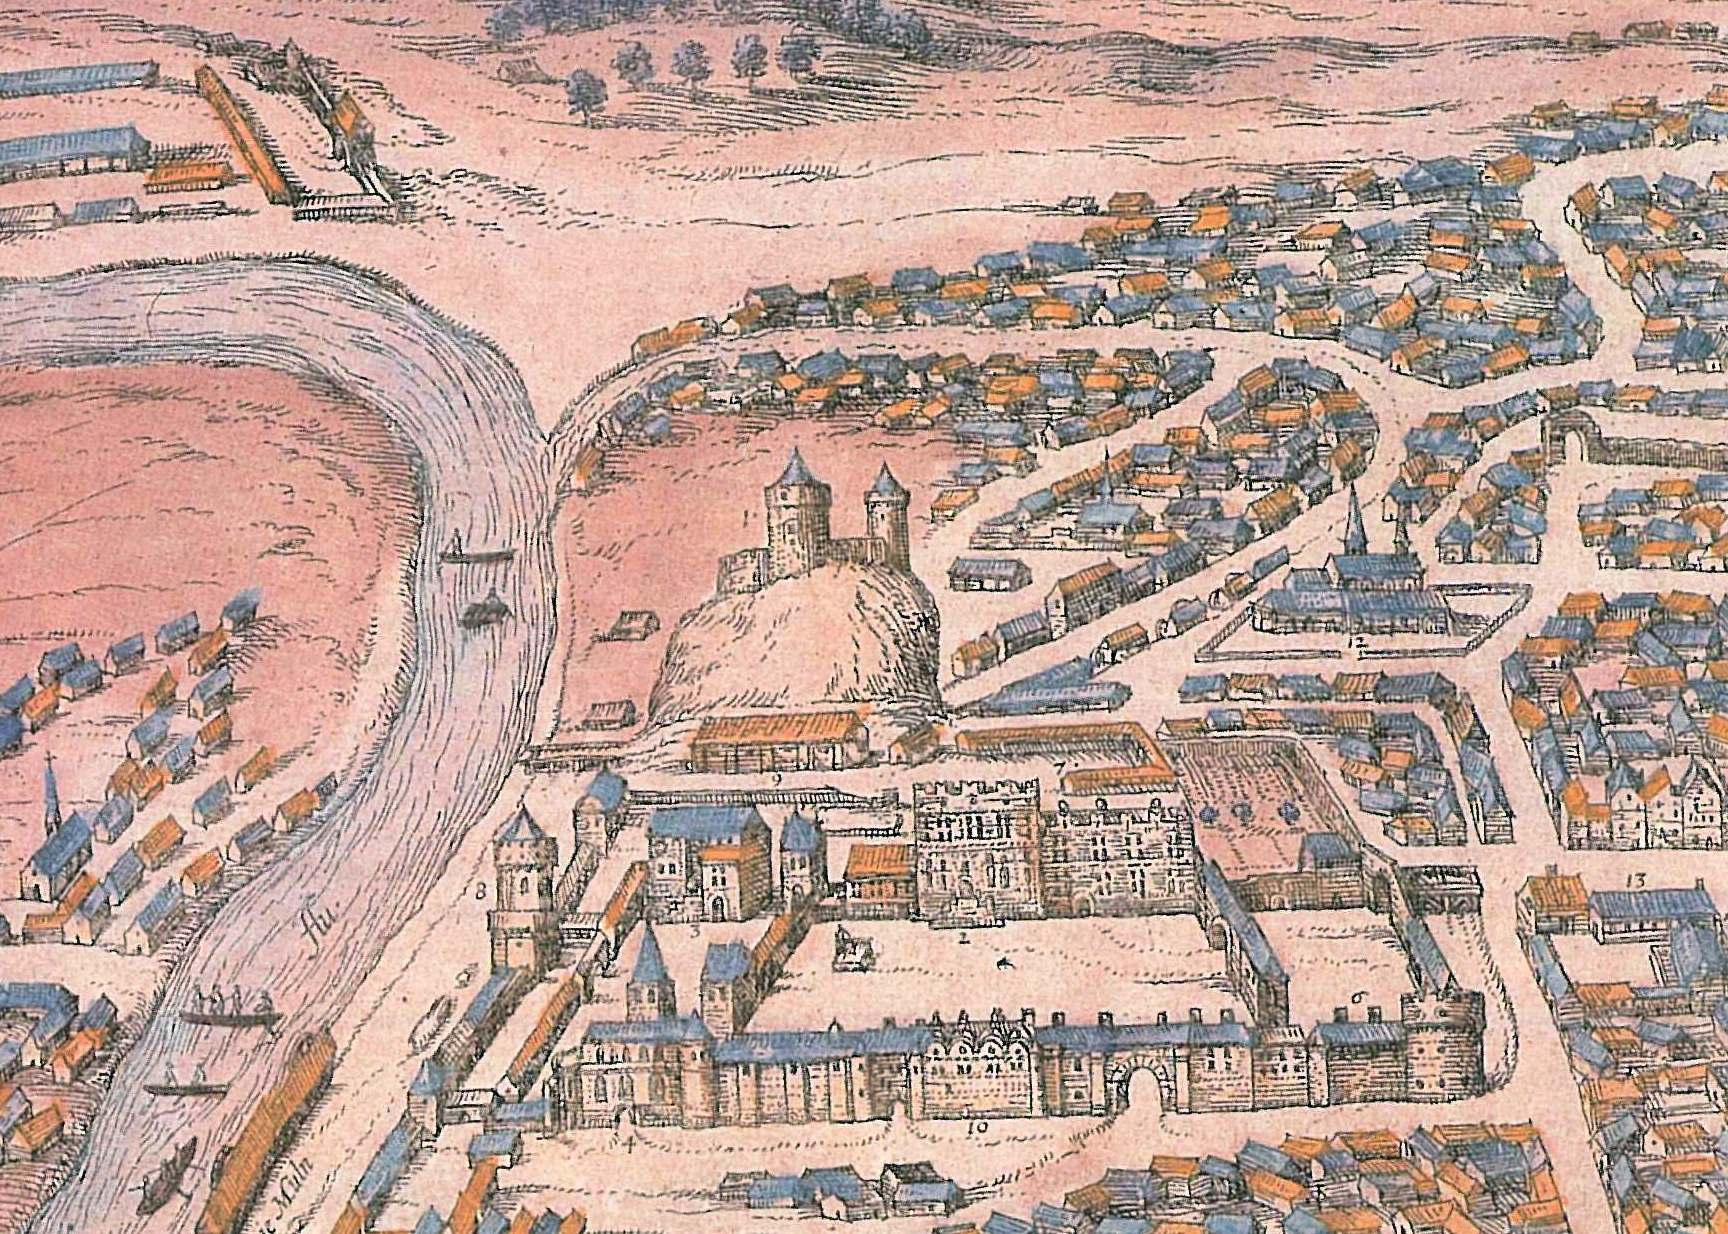 G. Brauno F.Hogenbergo Vilniaus miesto plano fragmentas 1571m. | V.Drėma. Dingęs Vilnius, p.30 1991m.